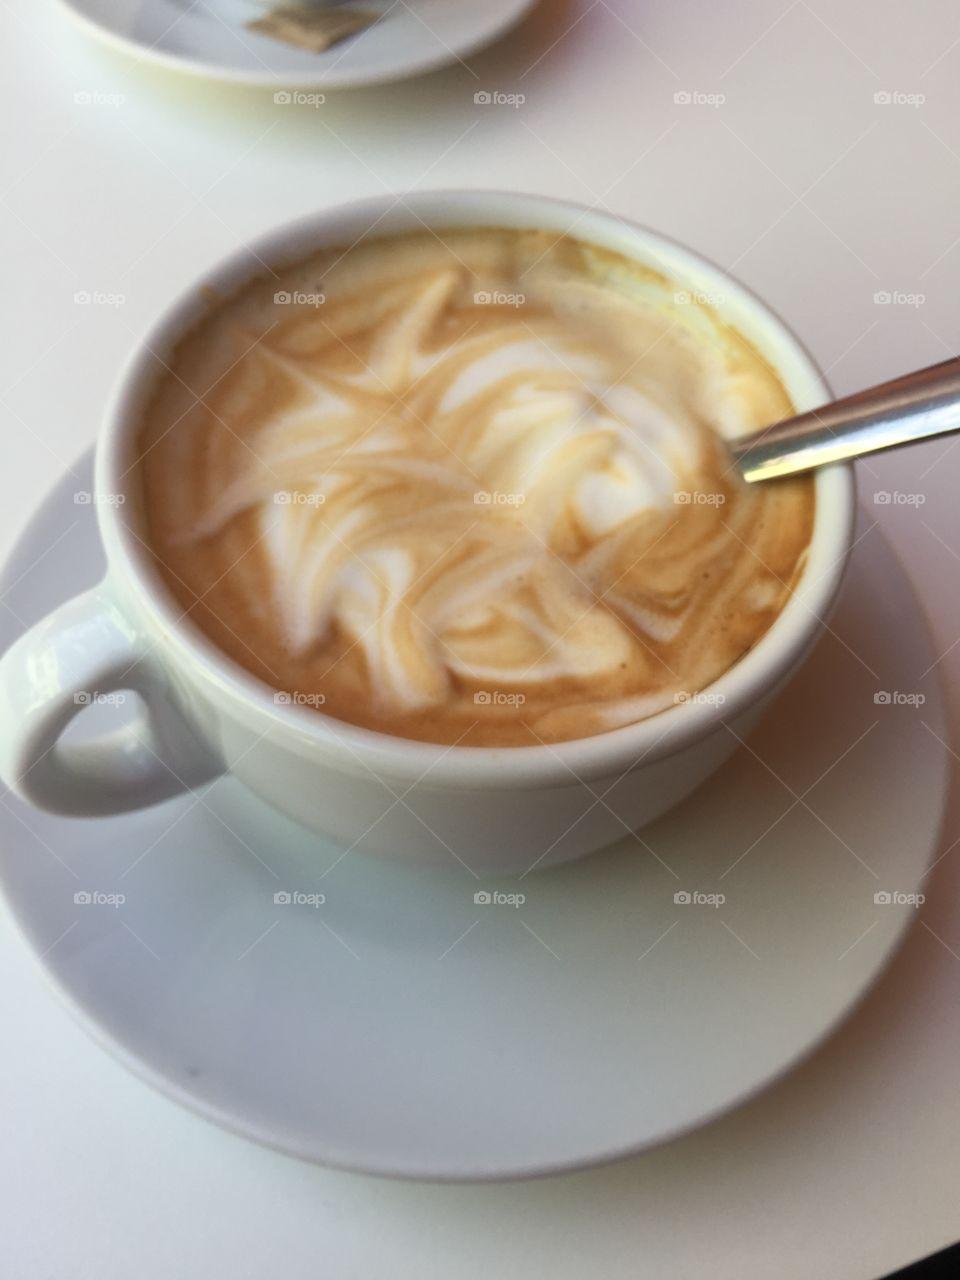 I upgraded my coffee